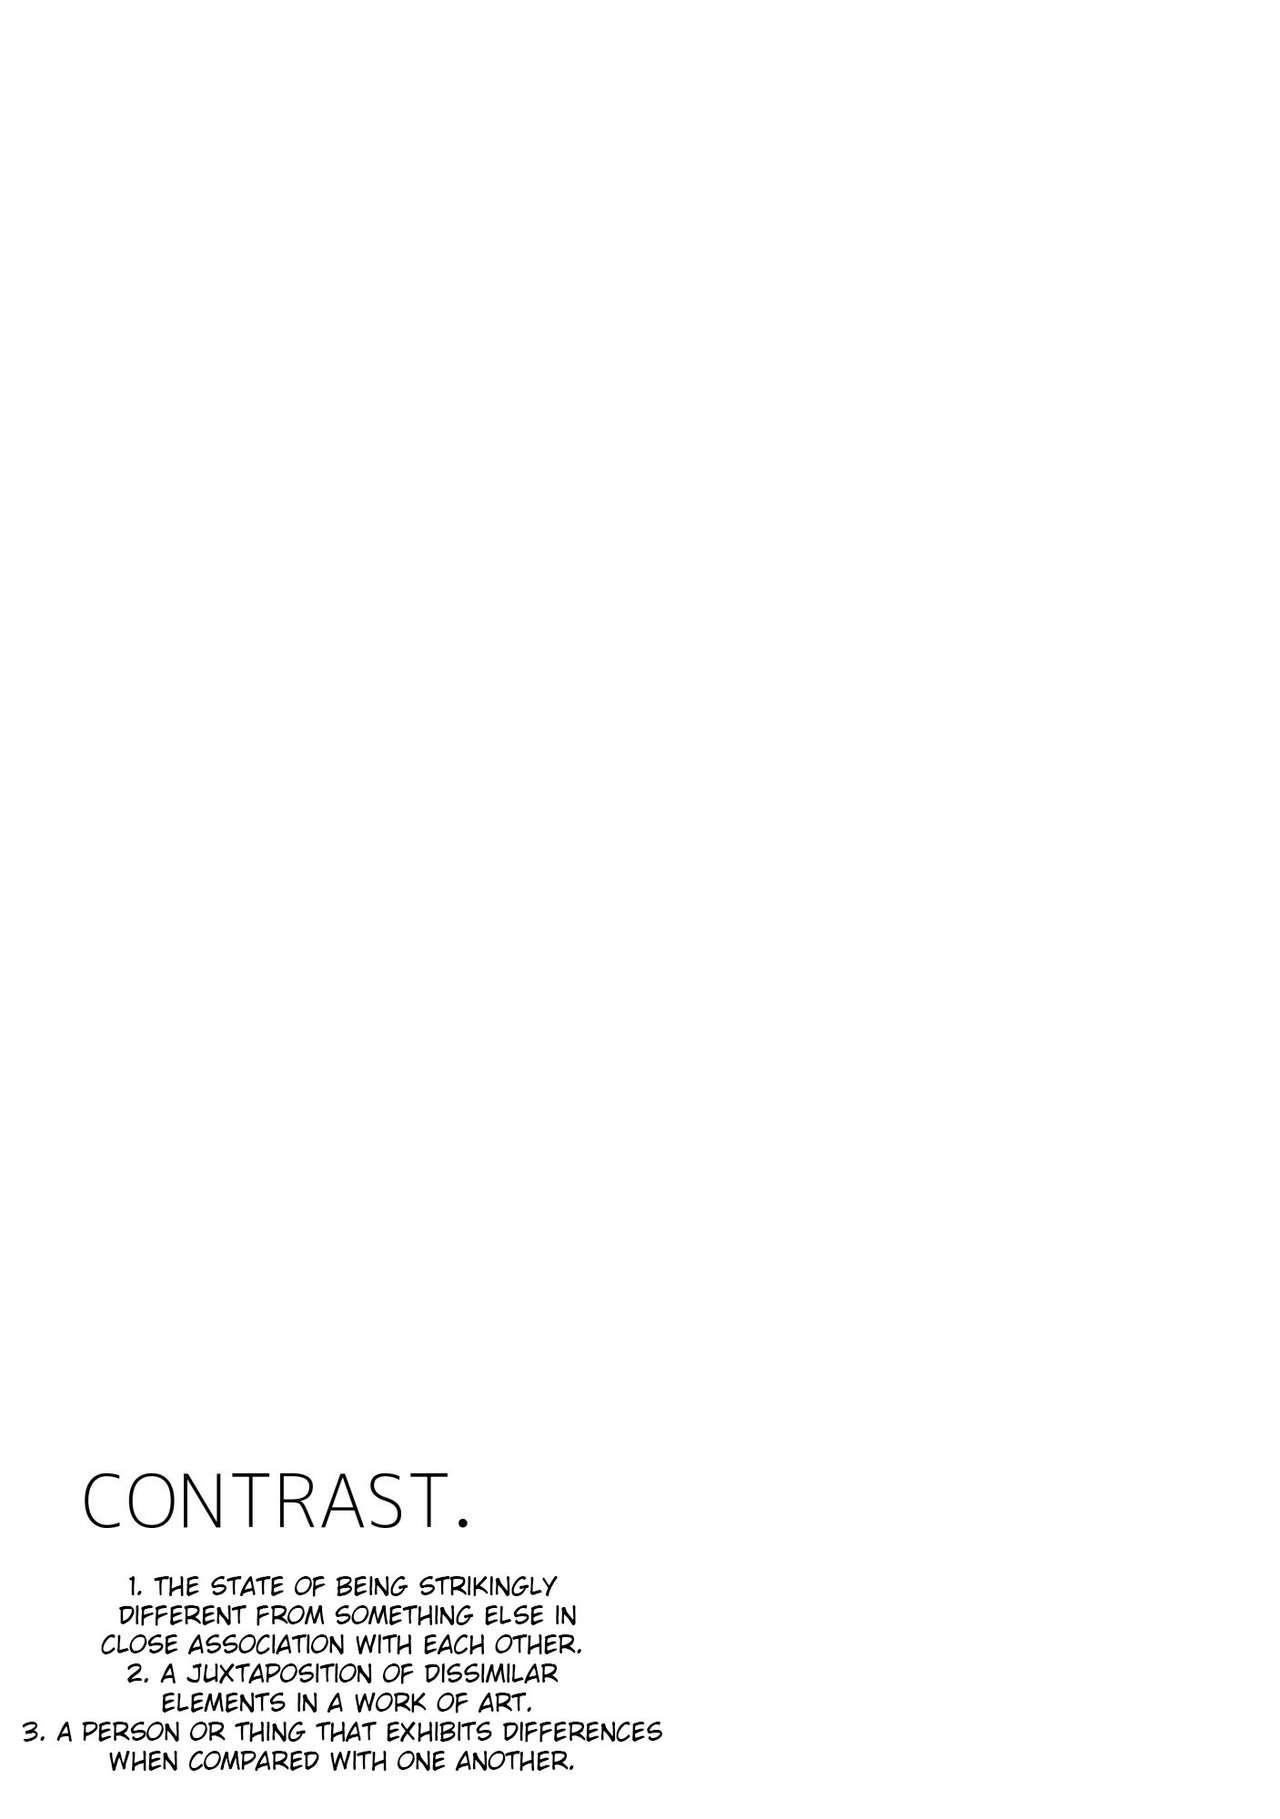 CONTRAST. 2